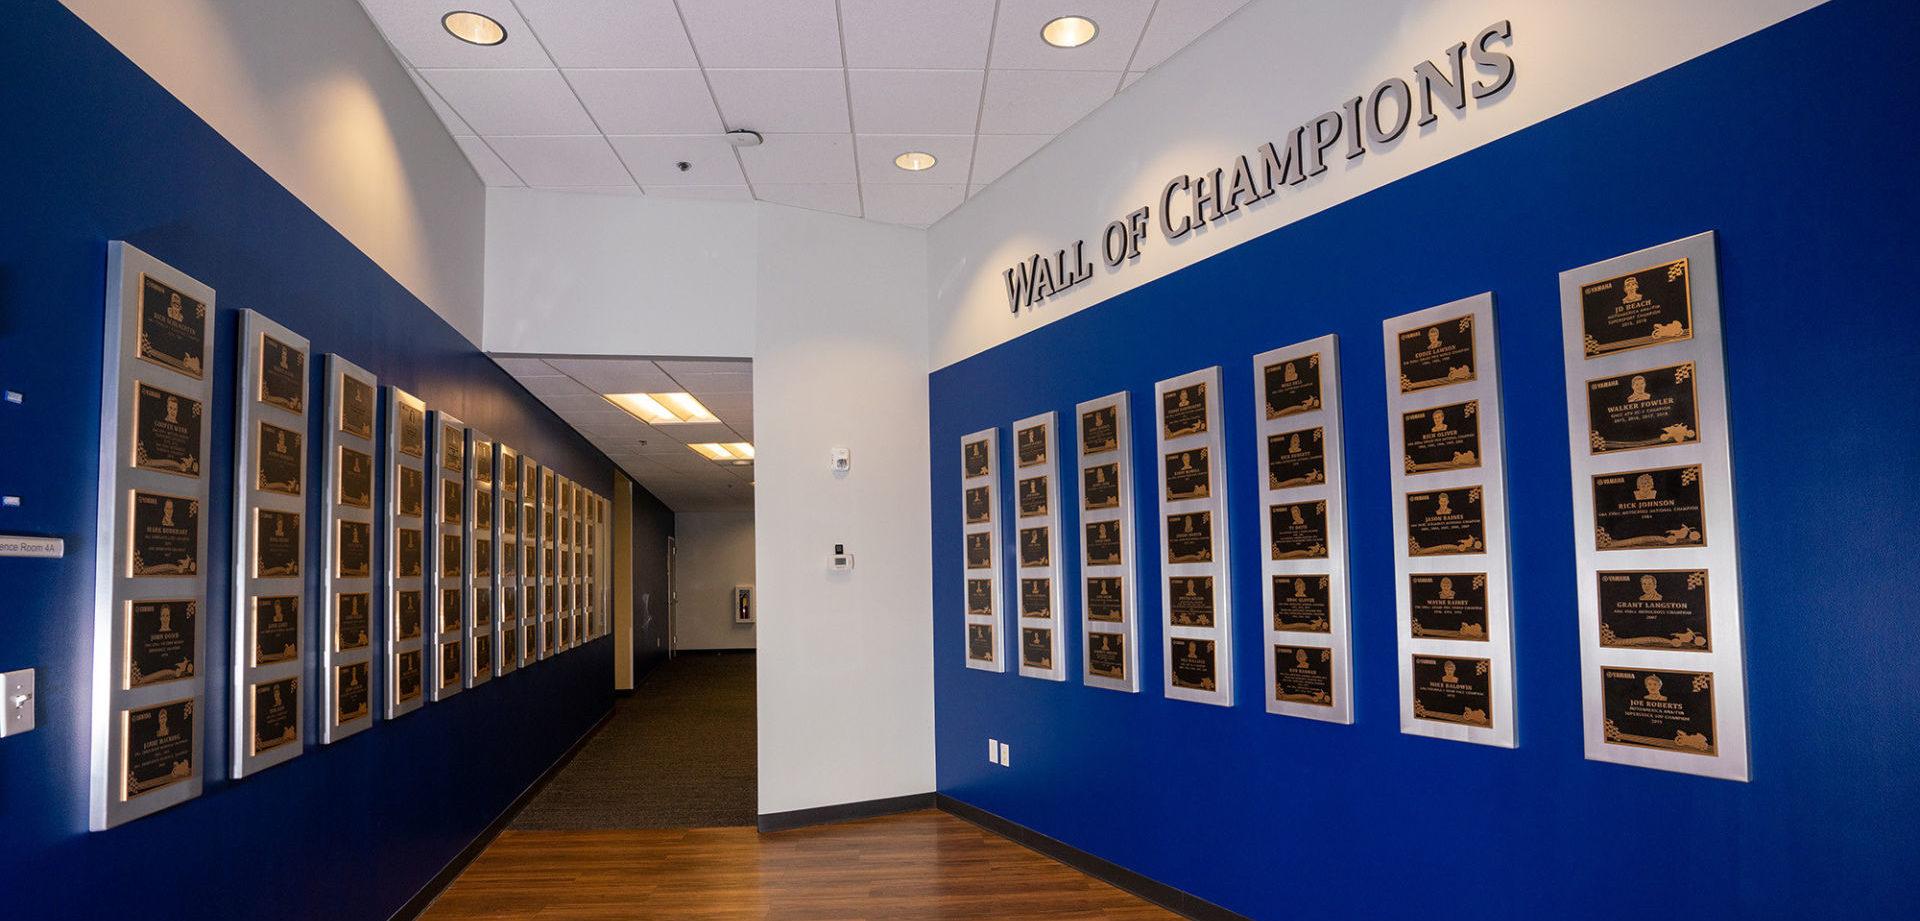 The relocated Wall of Champions at Yamaha's Marietta, Georgia facility. Photo courtesy of Yamaha Motor Corp., U.S.A.